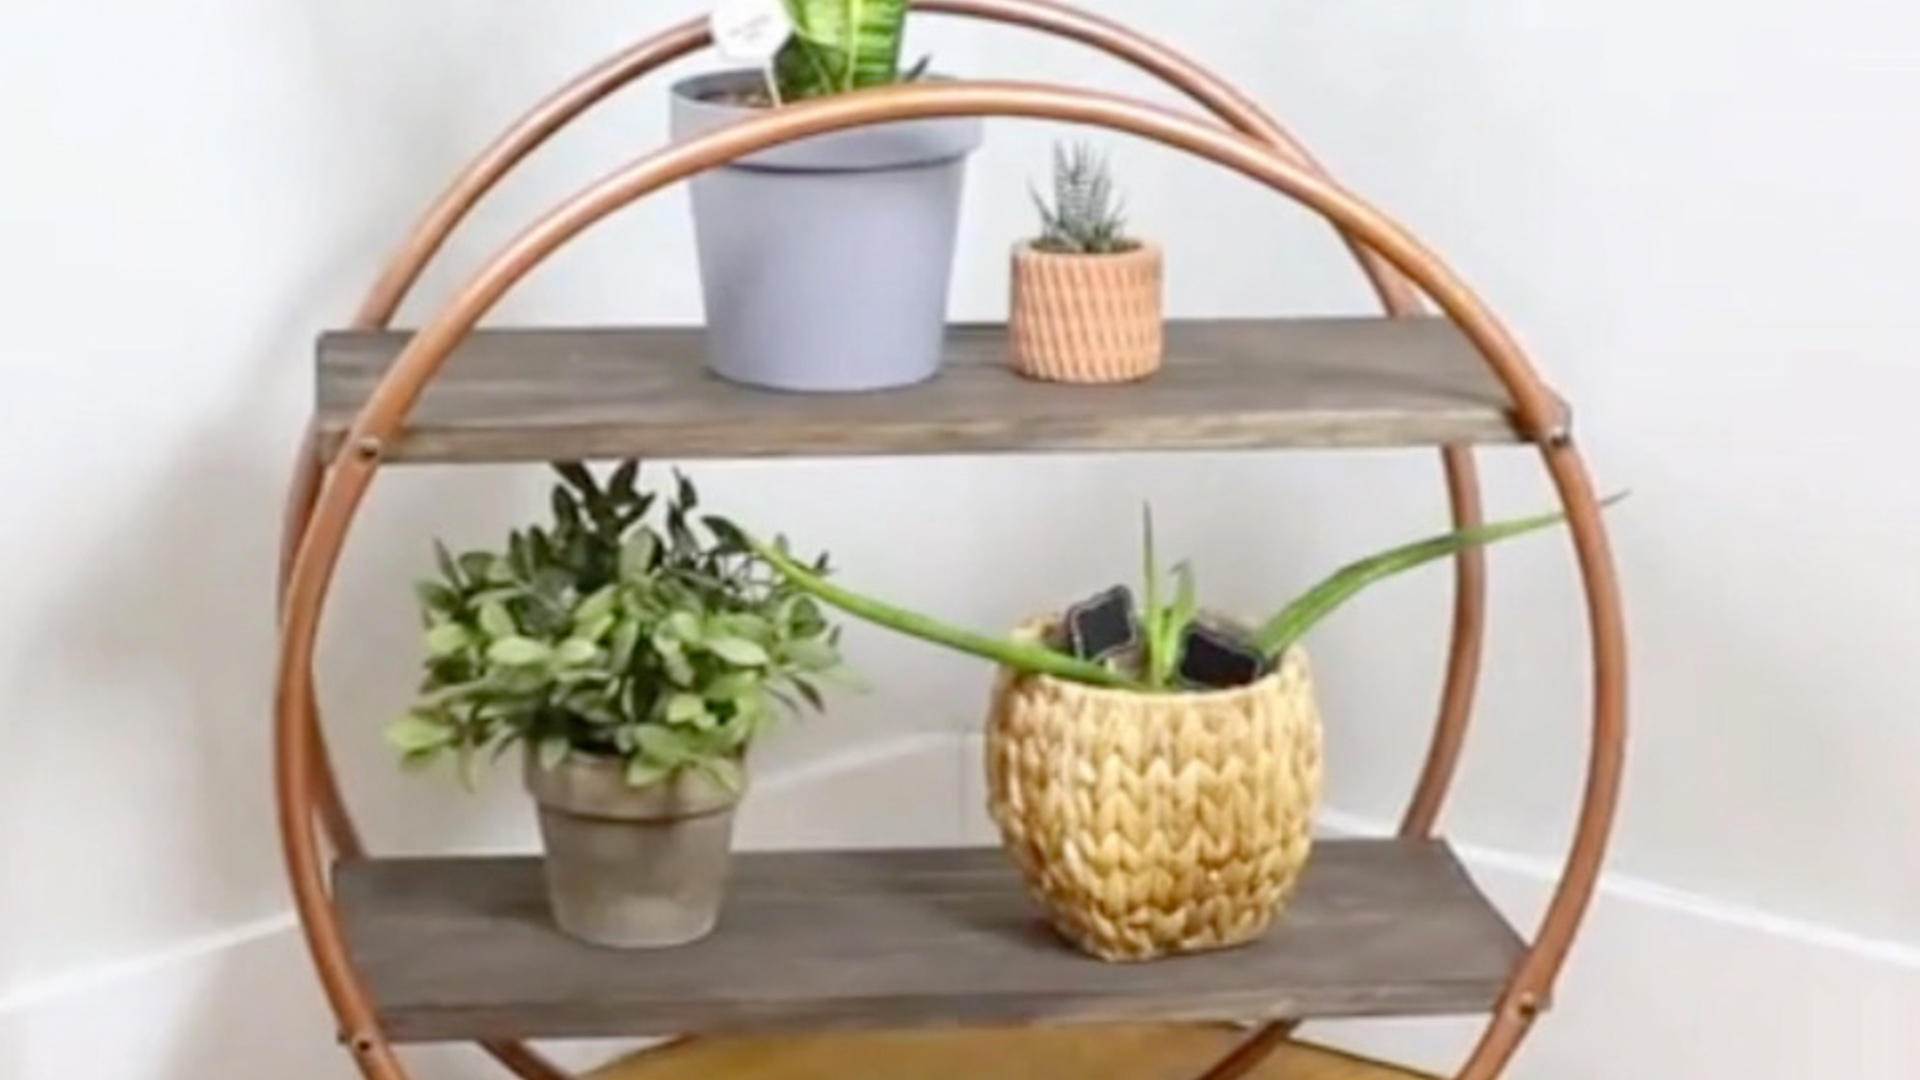 DIY Hula Hoop Shelf That Fits Any Budget | RTM ...